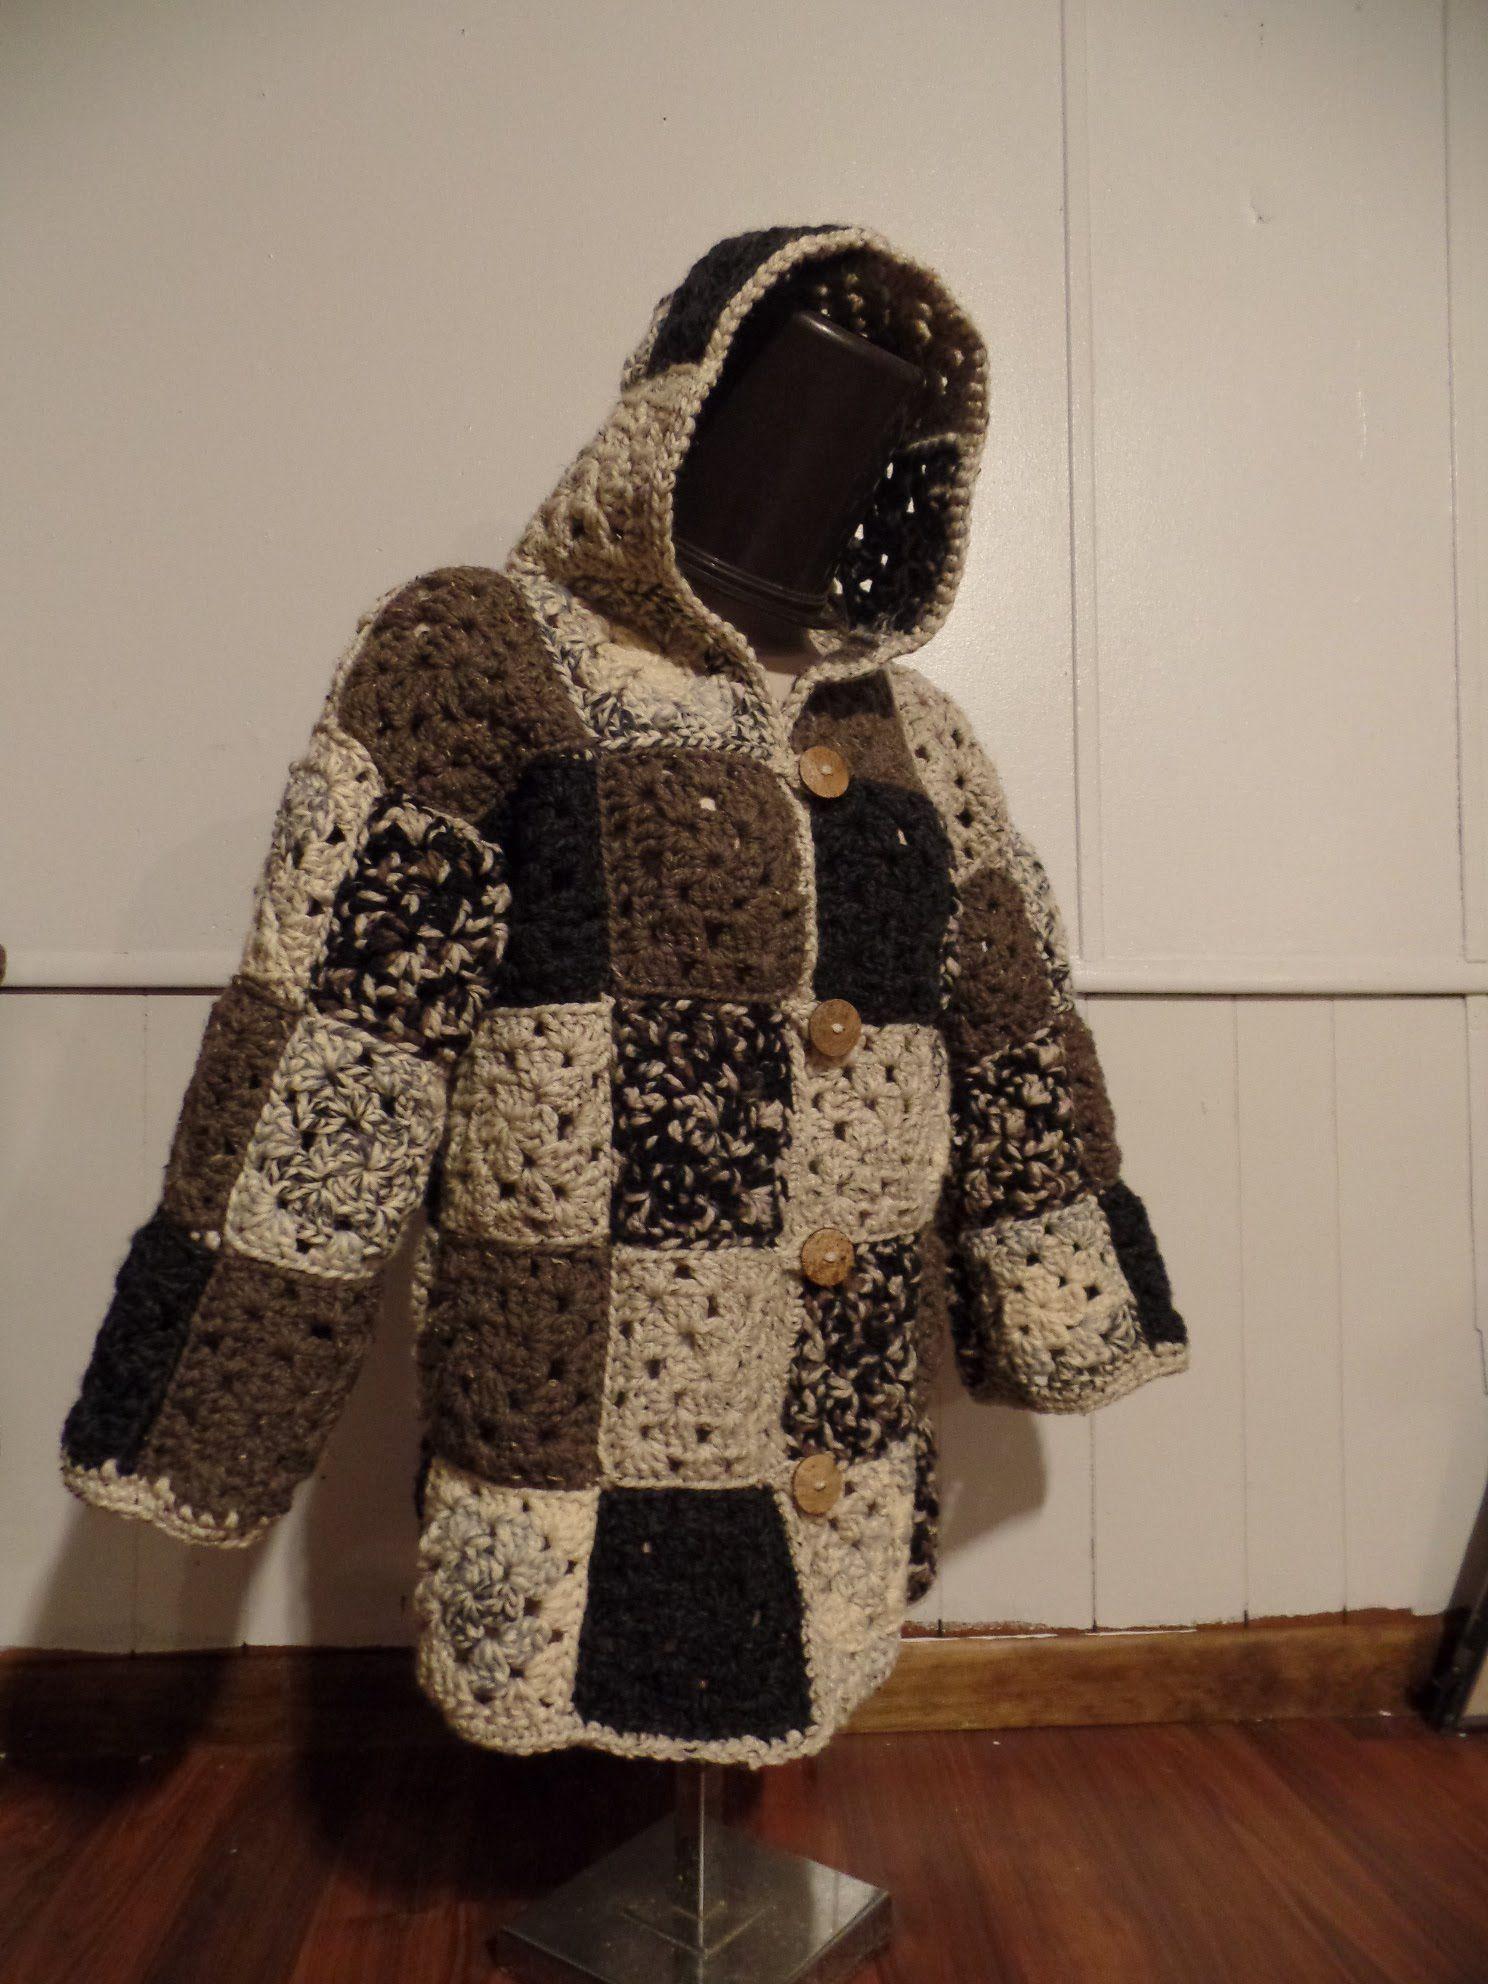 Crochet Granny Square Coat Jacket #TUTORIAL | videos crochet ...